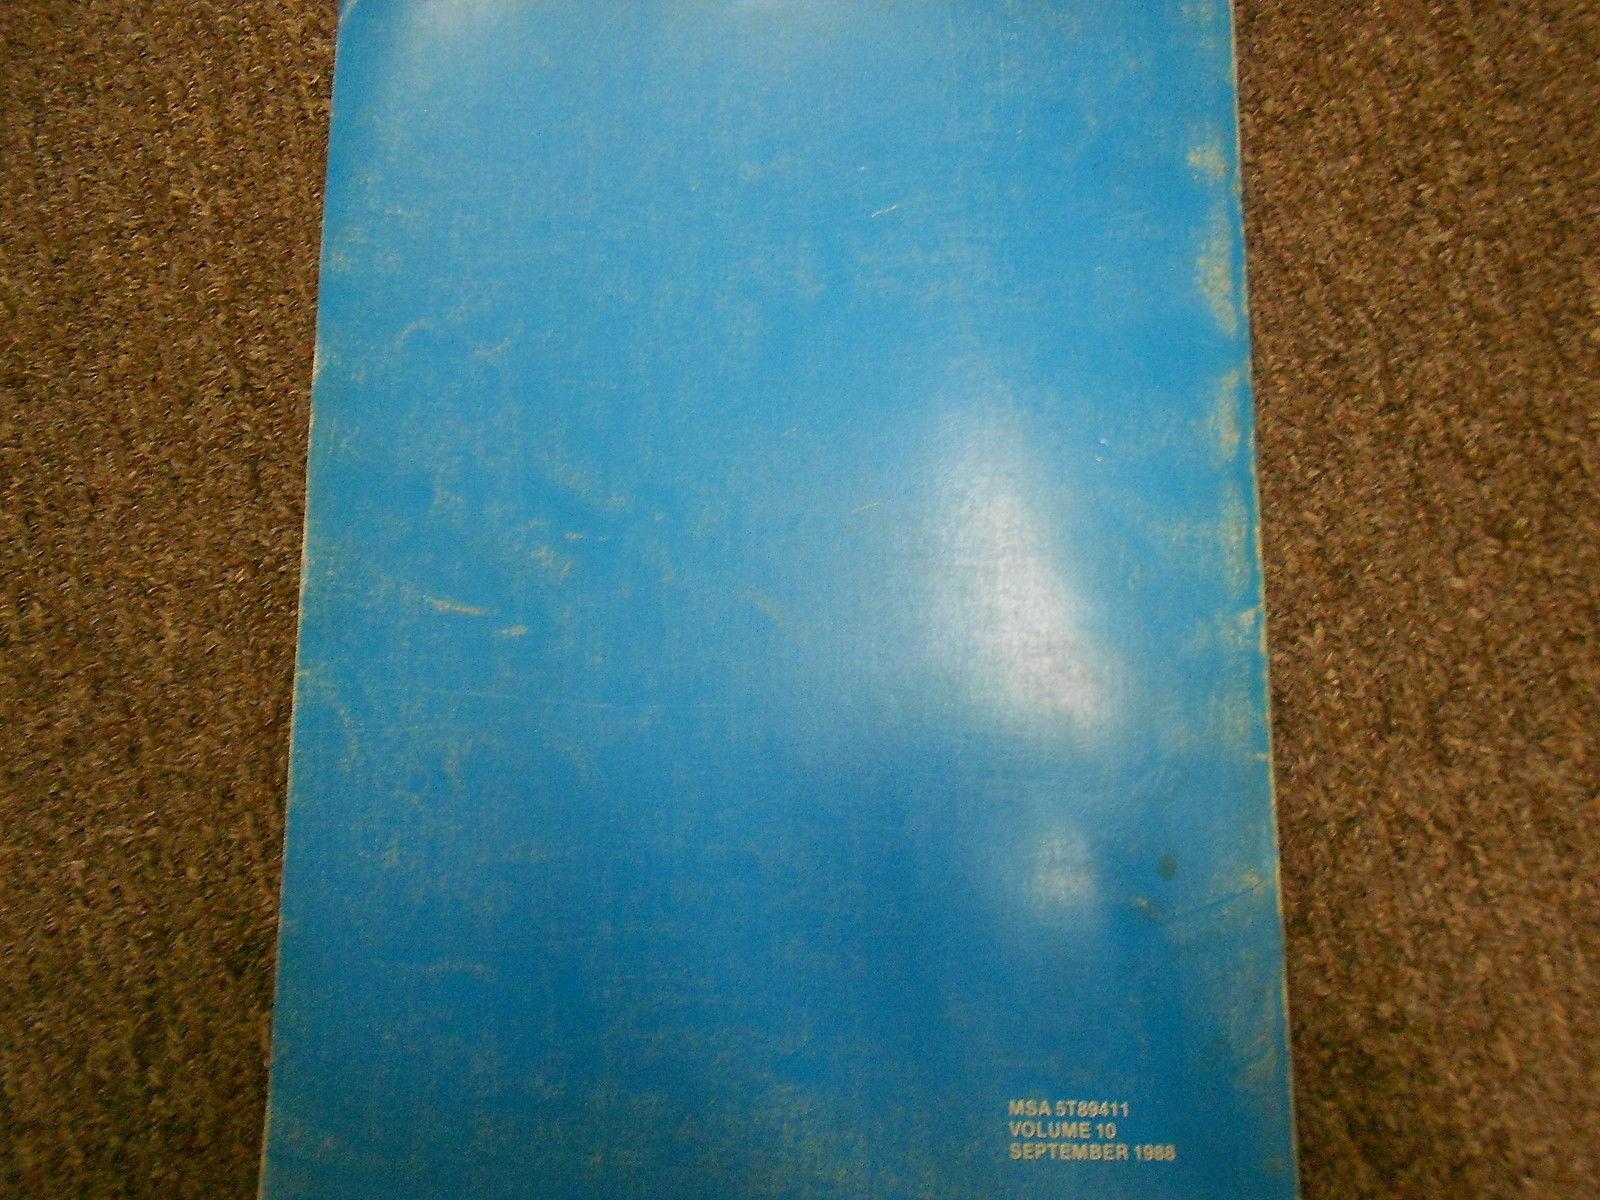 1987 Subaru Service Bulletins Service Repair Shop Manual FACTORY OEM BOOK 87